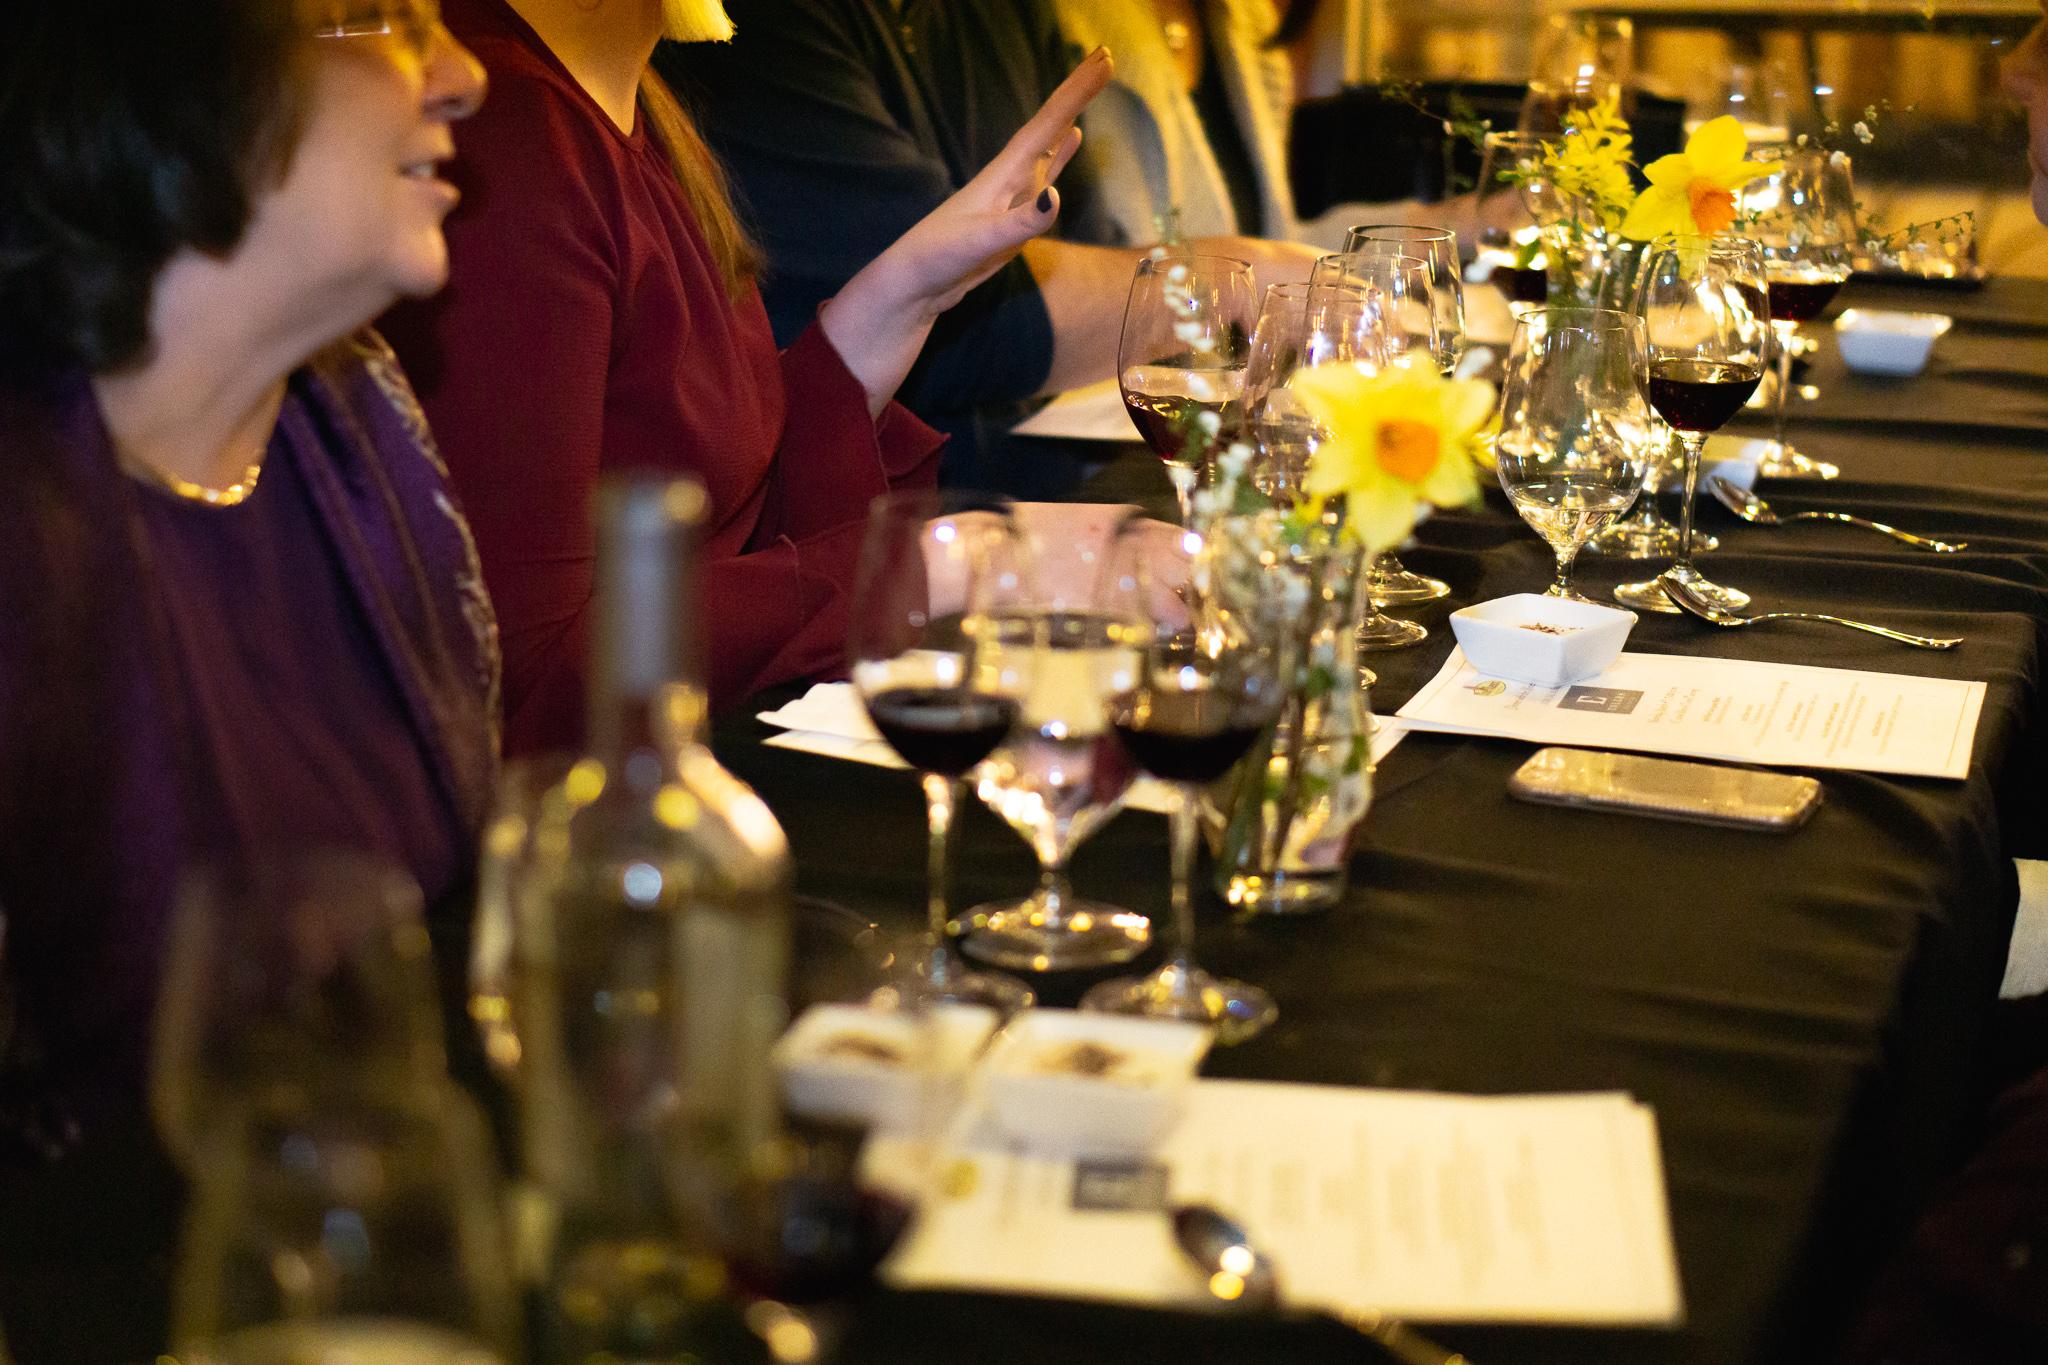 wine-maestro-the-sassy-gourmet-wine80.jpg